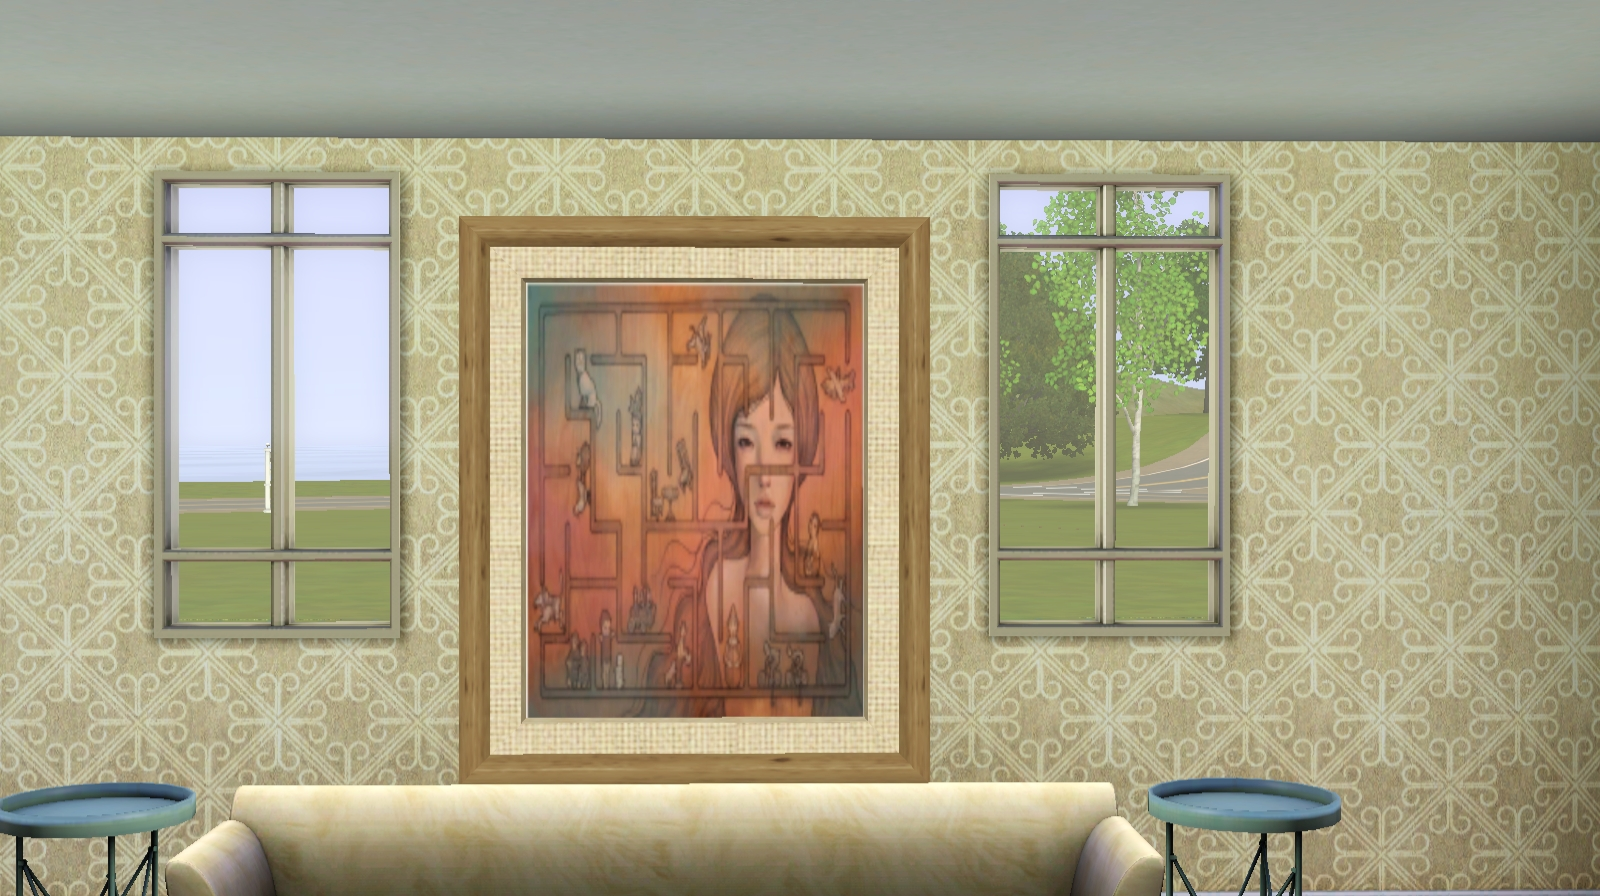 http://2.bp.blogspot.com/-mrbZR4ynGWU/Tz63zGD8g3I/AAAAAAAB2M4/g0Mt1_Ljmt4/s1600/monthly_02_2012_5f9d3277fc2351266dfb4ecfd127b432-screenshot-3.jpg